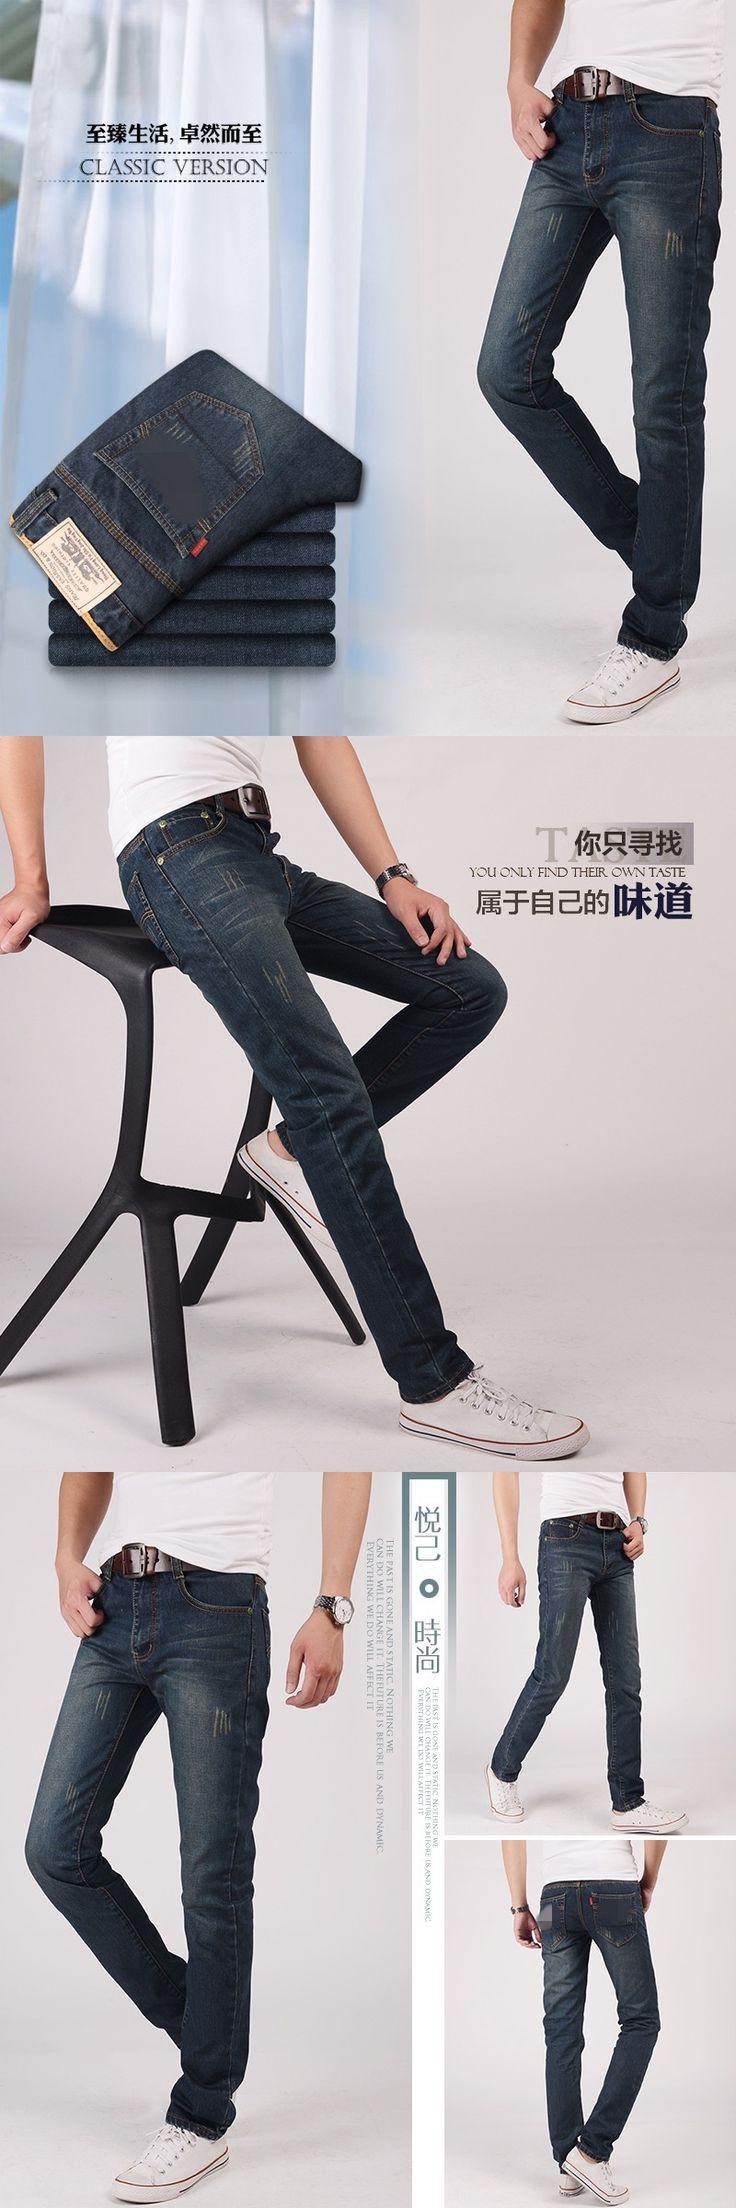 Logo Brand Mens Jeans High Quality Stripe Slim Black Jeans For Men Fashion Designer Denim Skinny Jeans Men Jeans Herrenhose